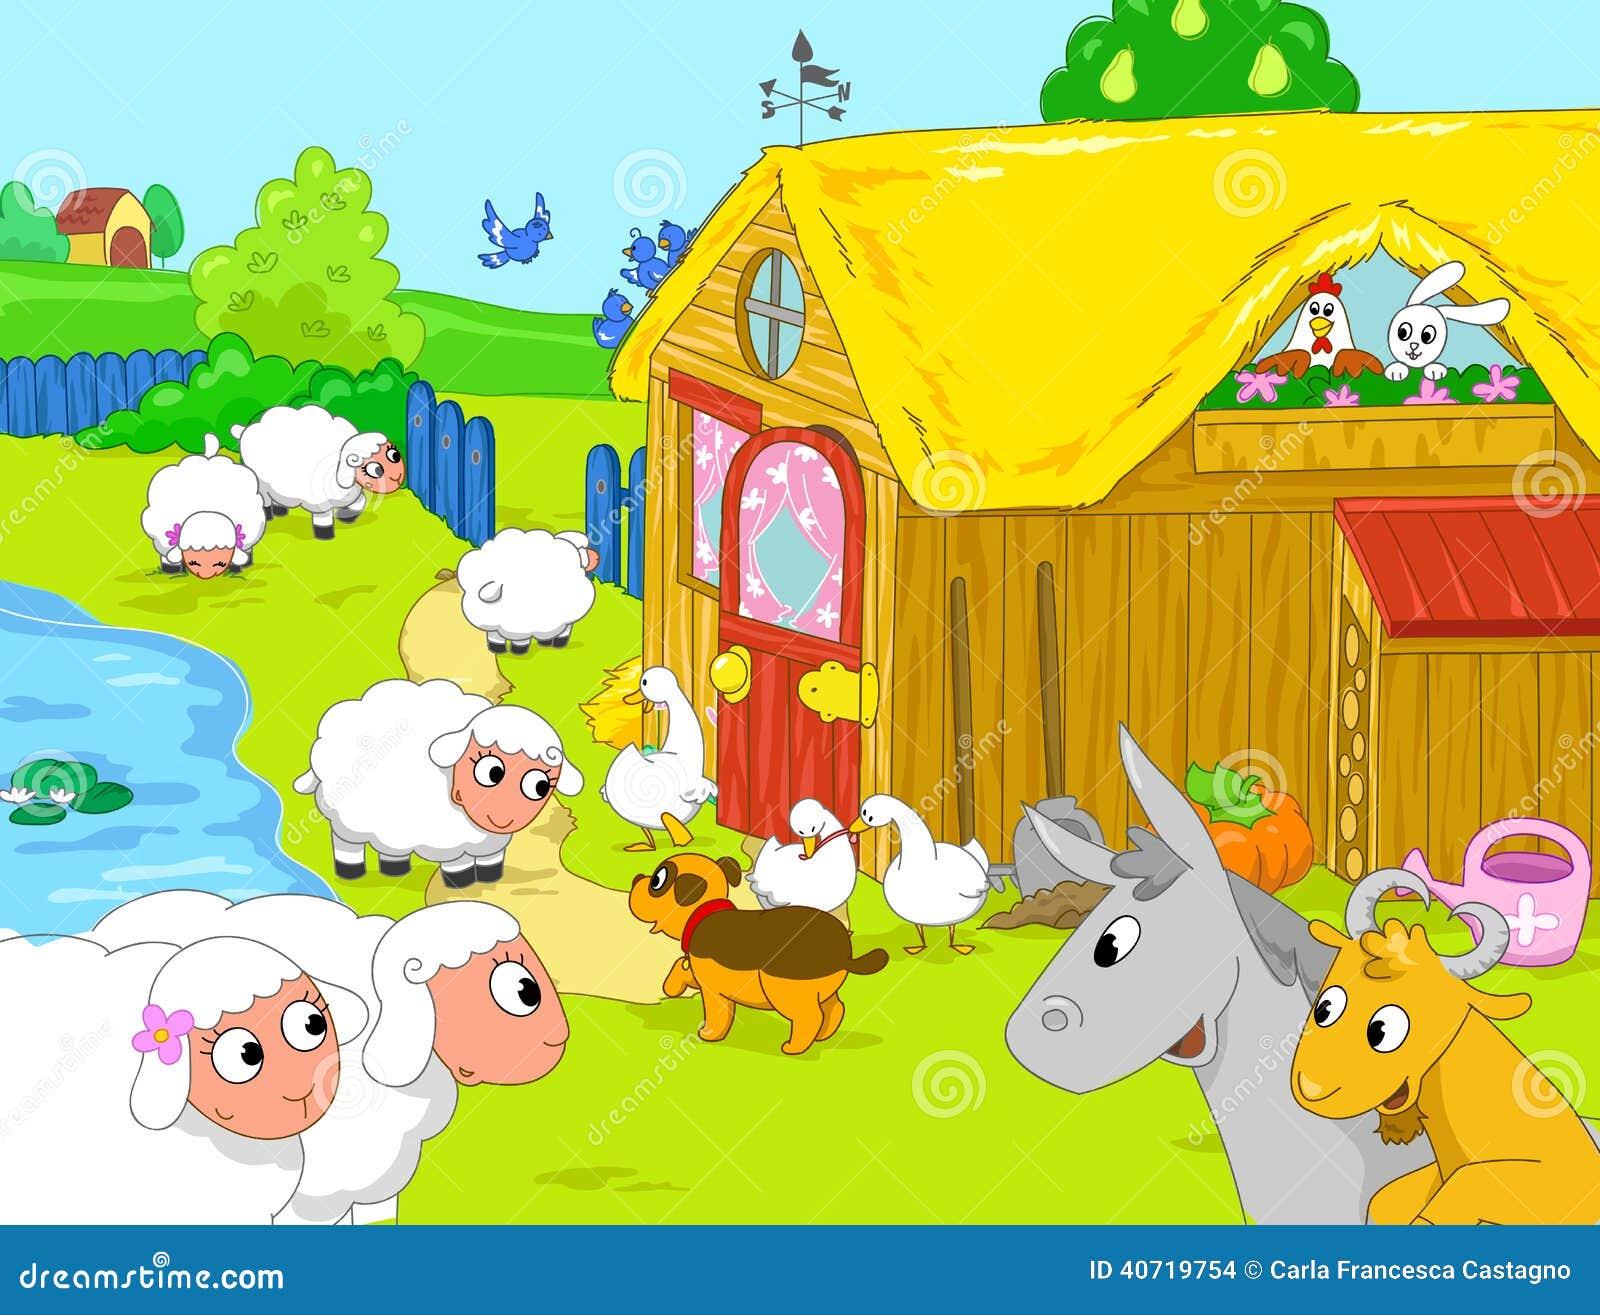 Indian House Exterior Design: Funny Little House Cartoon Vector Illustration